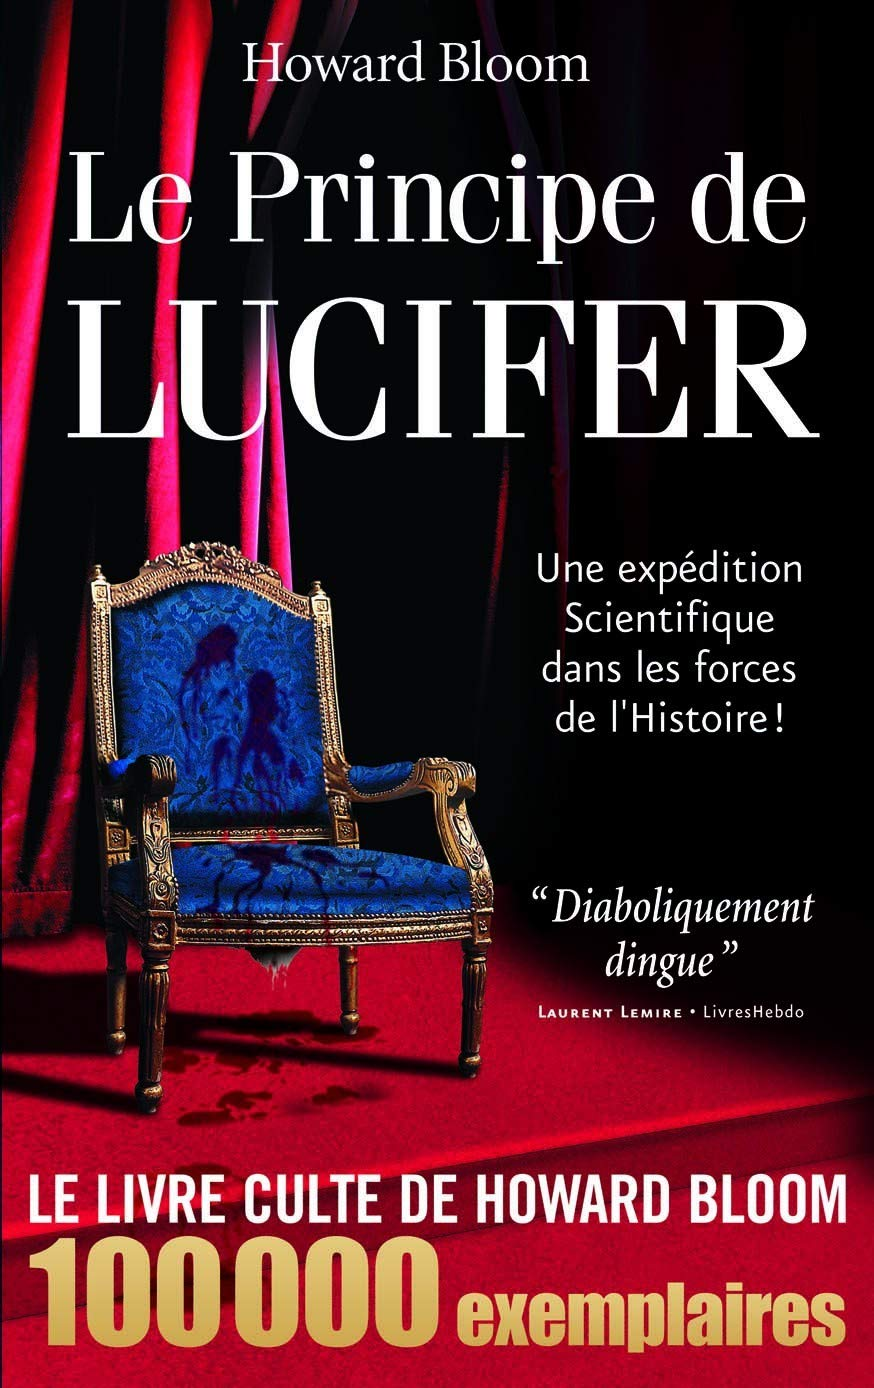 Principe de Lucifer (tome 1) (Comportement humain): HOWARD